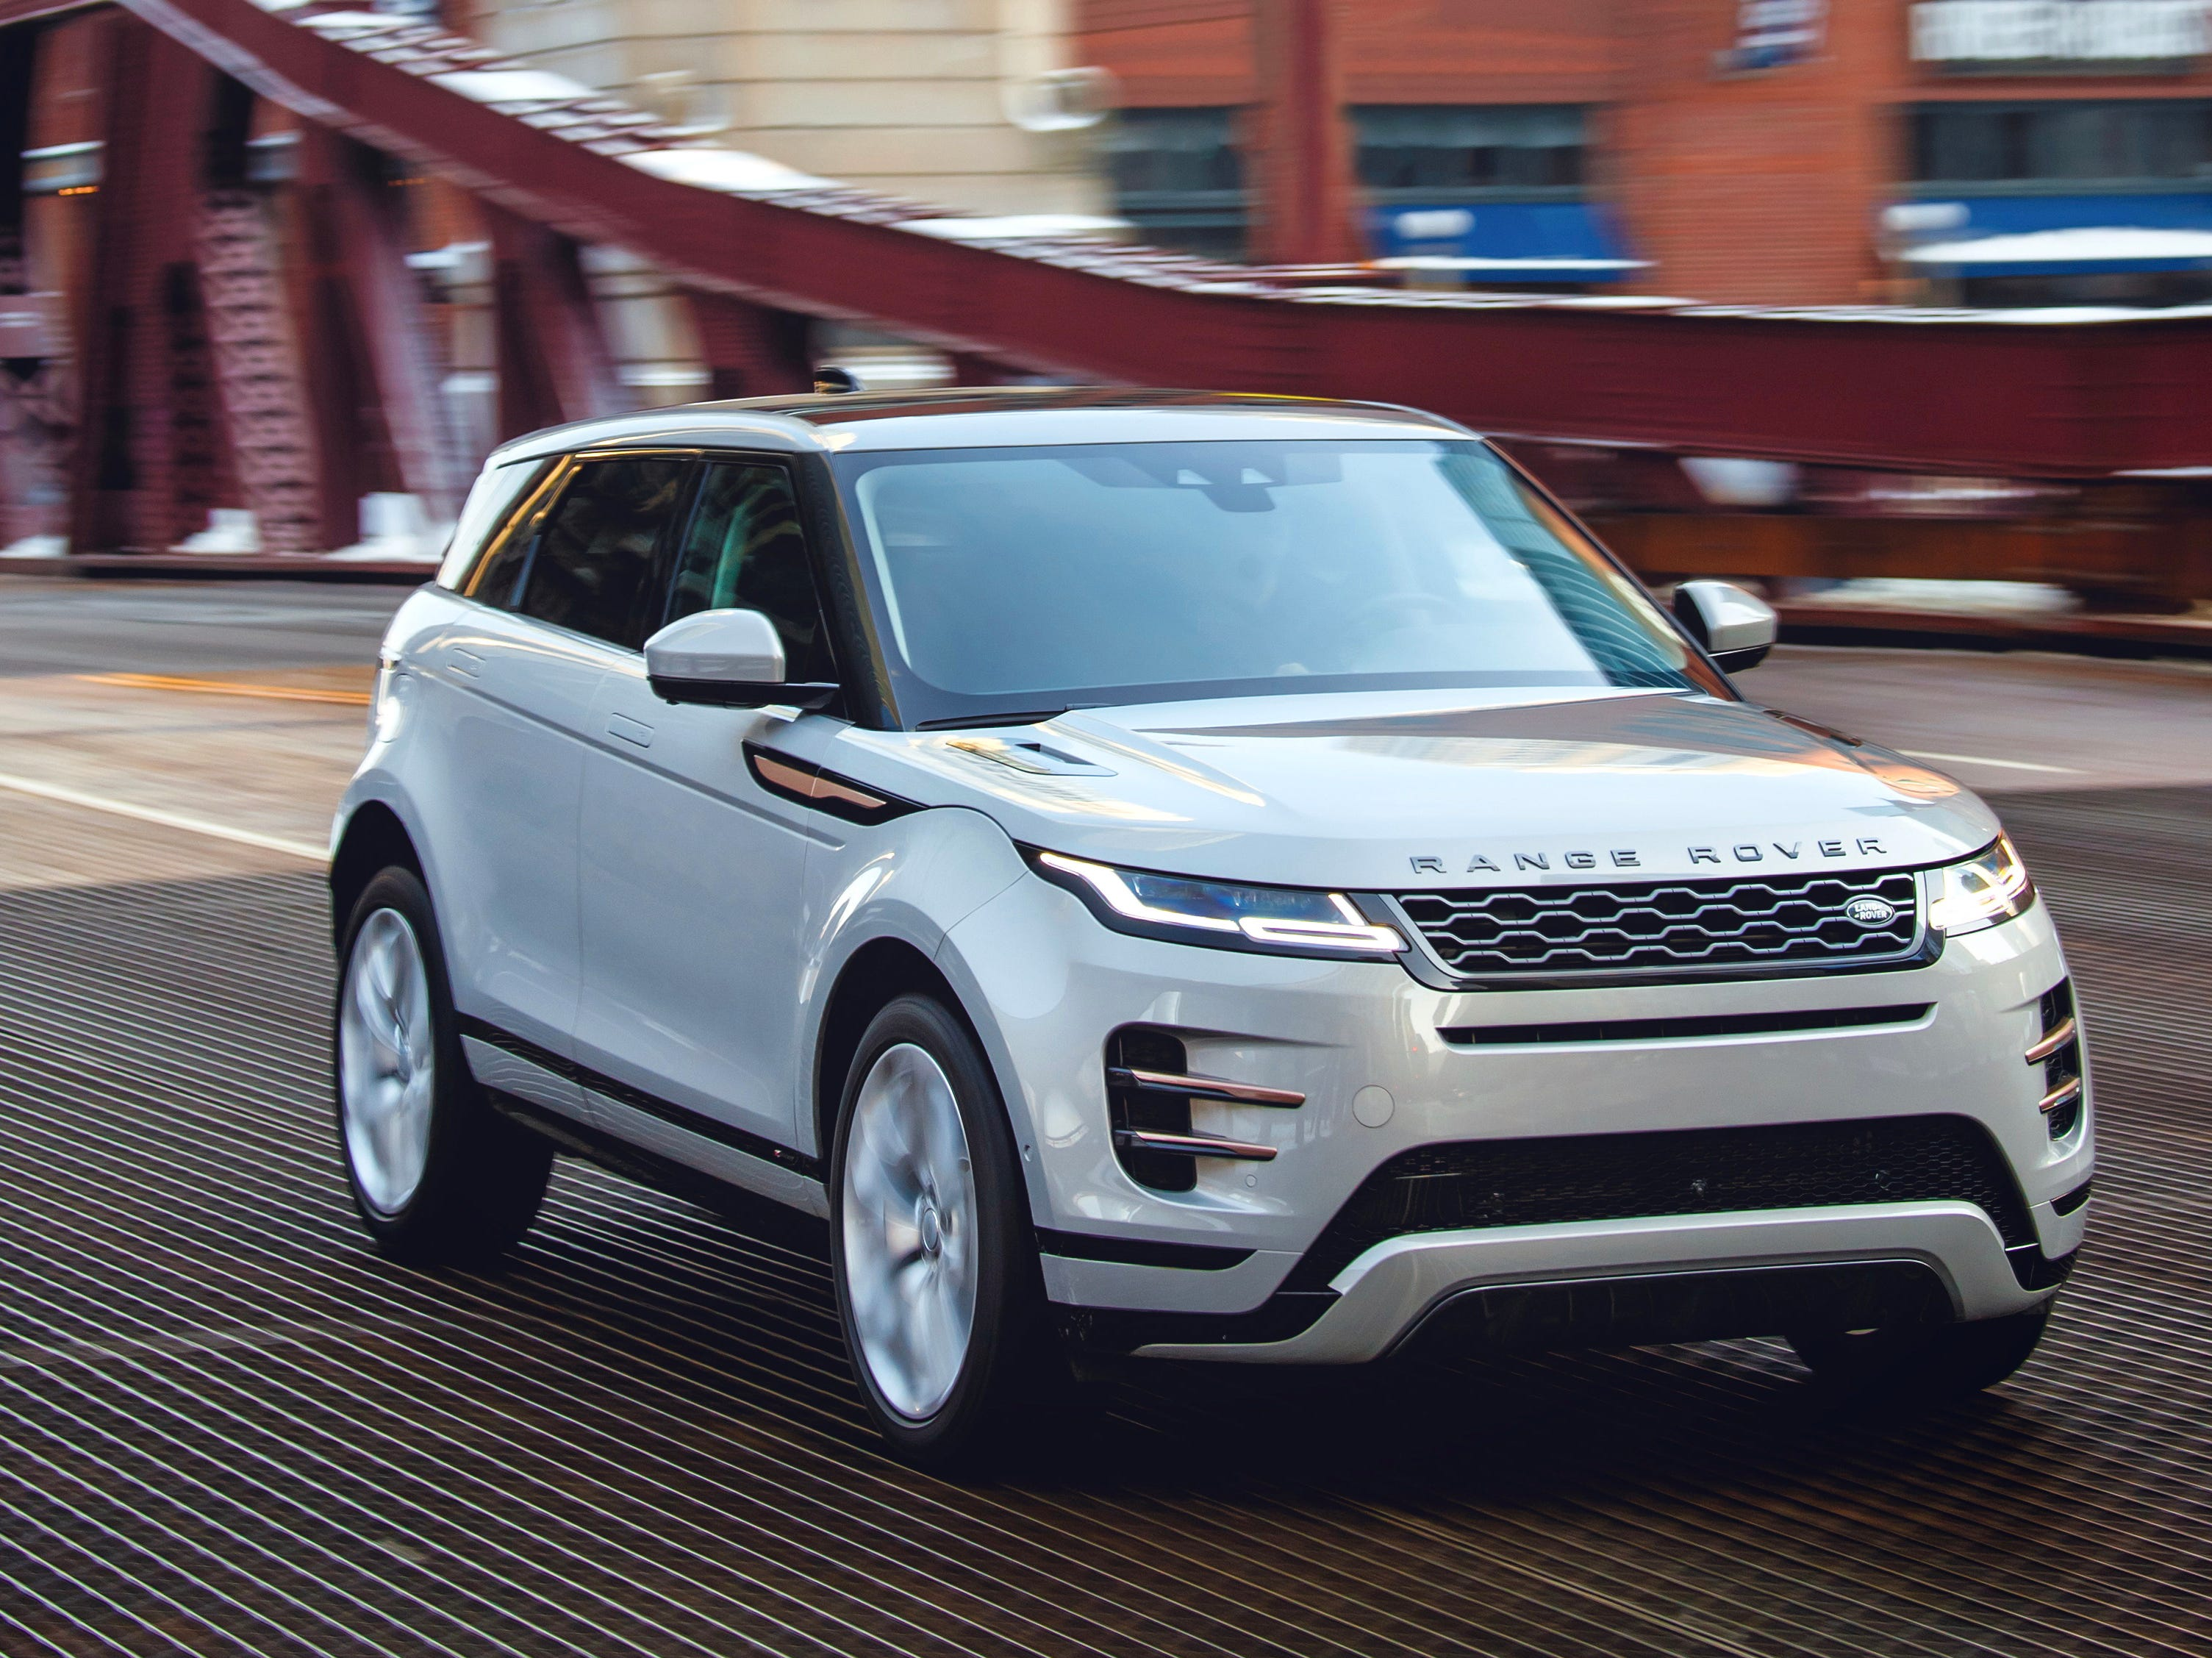 2020 Range Rover Evoque.